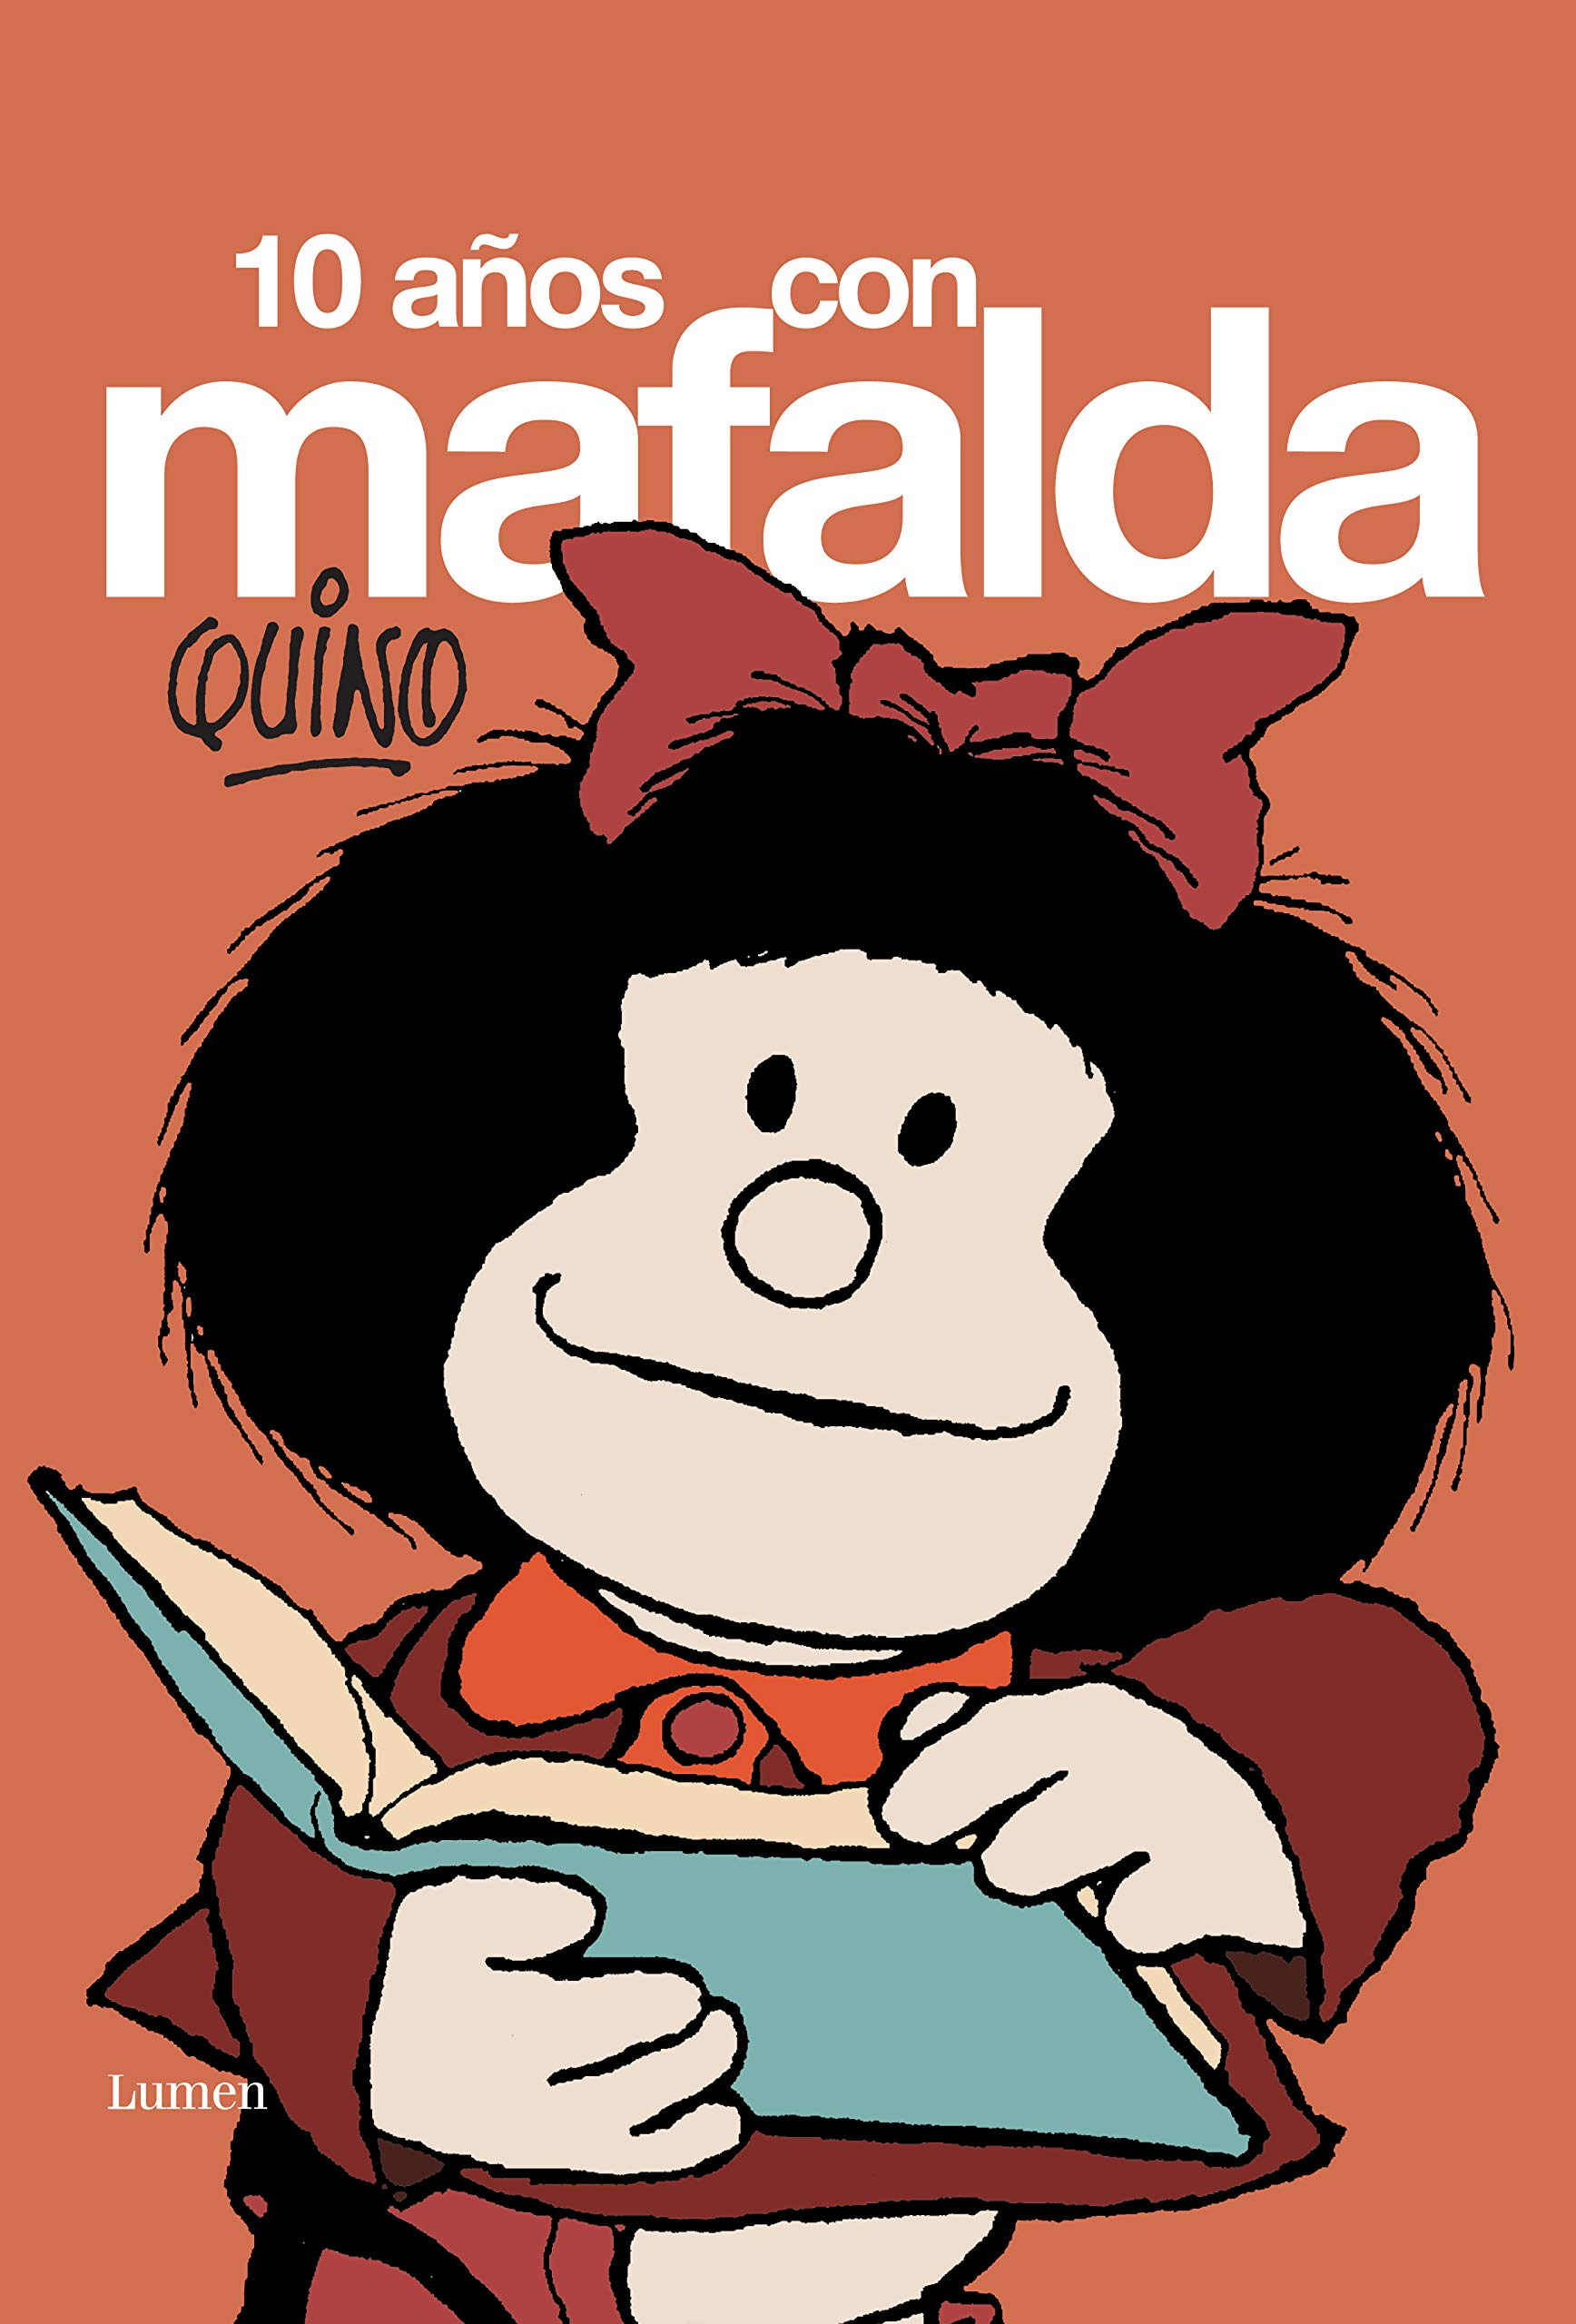 10 años con Mafalda (LUMEN GRÁFICA) Tapa dura – 3 jul 2018 Quino 842644511X Argentine wit and humor Pictorial.